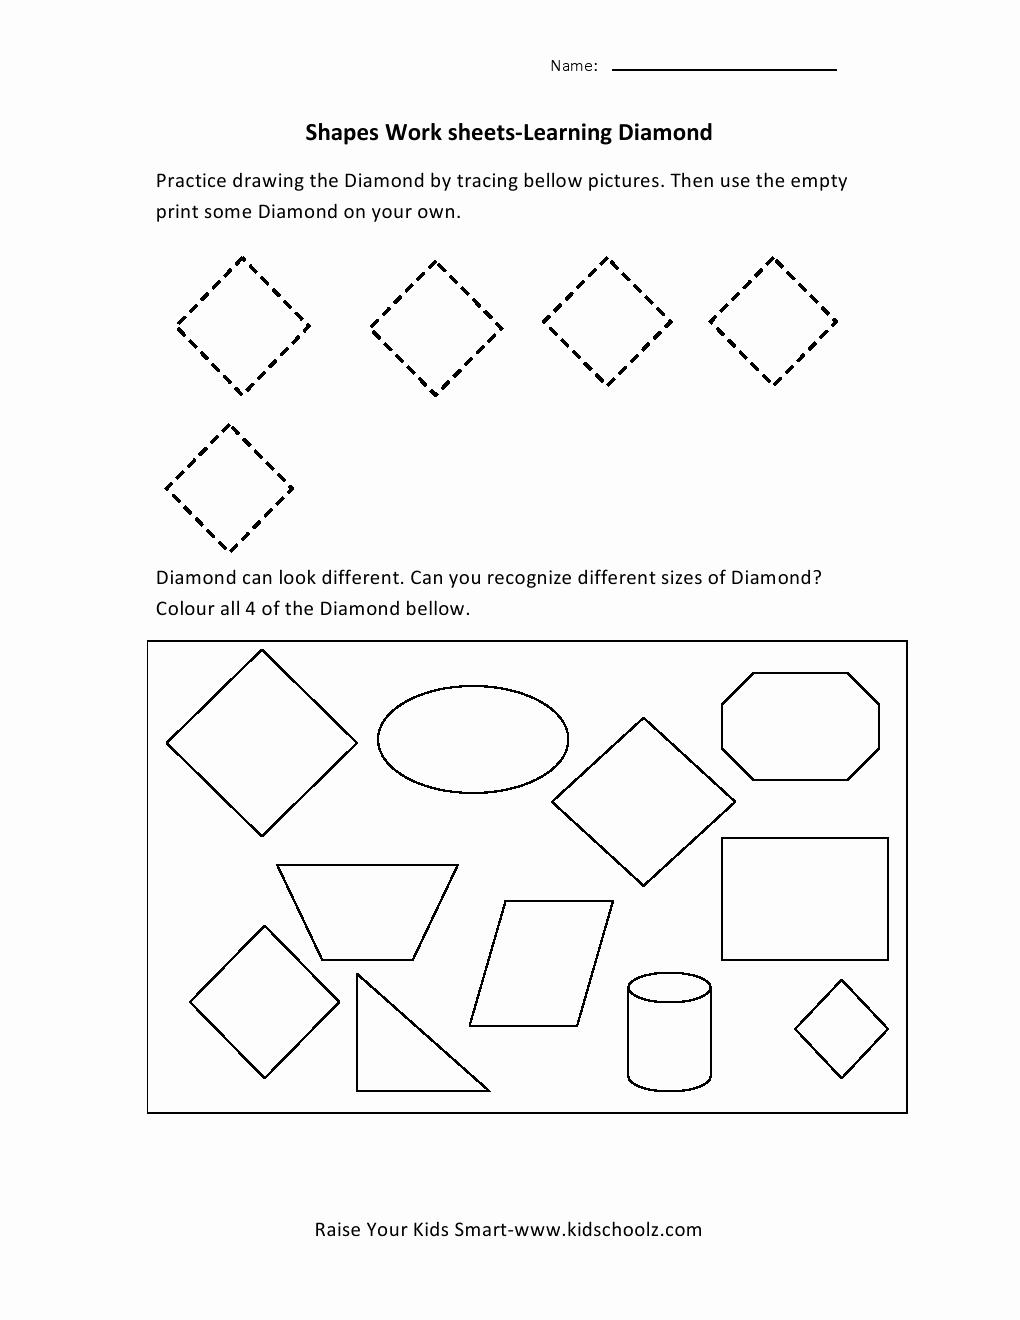 Diamond Worksheets for Preschool Unique 8 Best Of Diamond Worksheets for Preschoolers